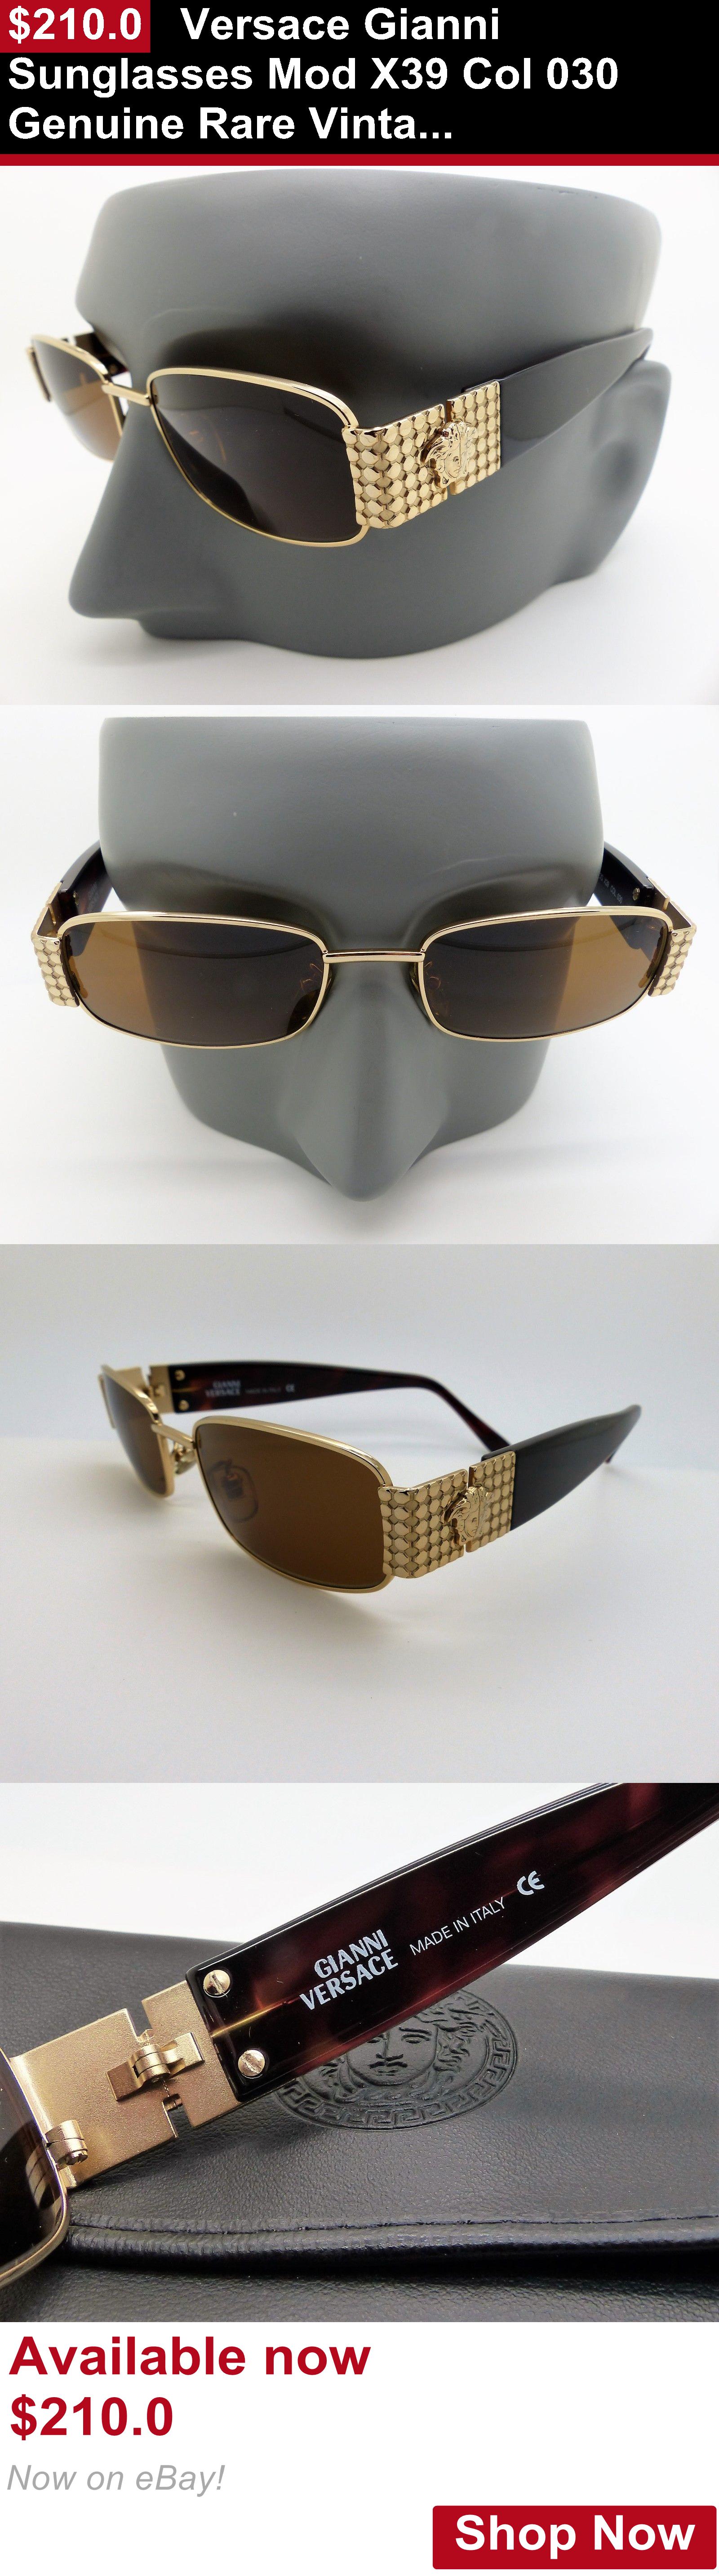 Col Mod X39 Vintage AccessoriesVersace Sunglasses Gianni 030 iOkPXTuZ